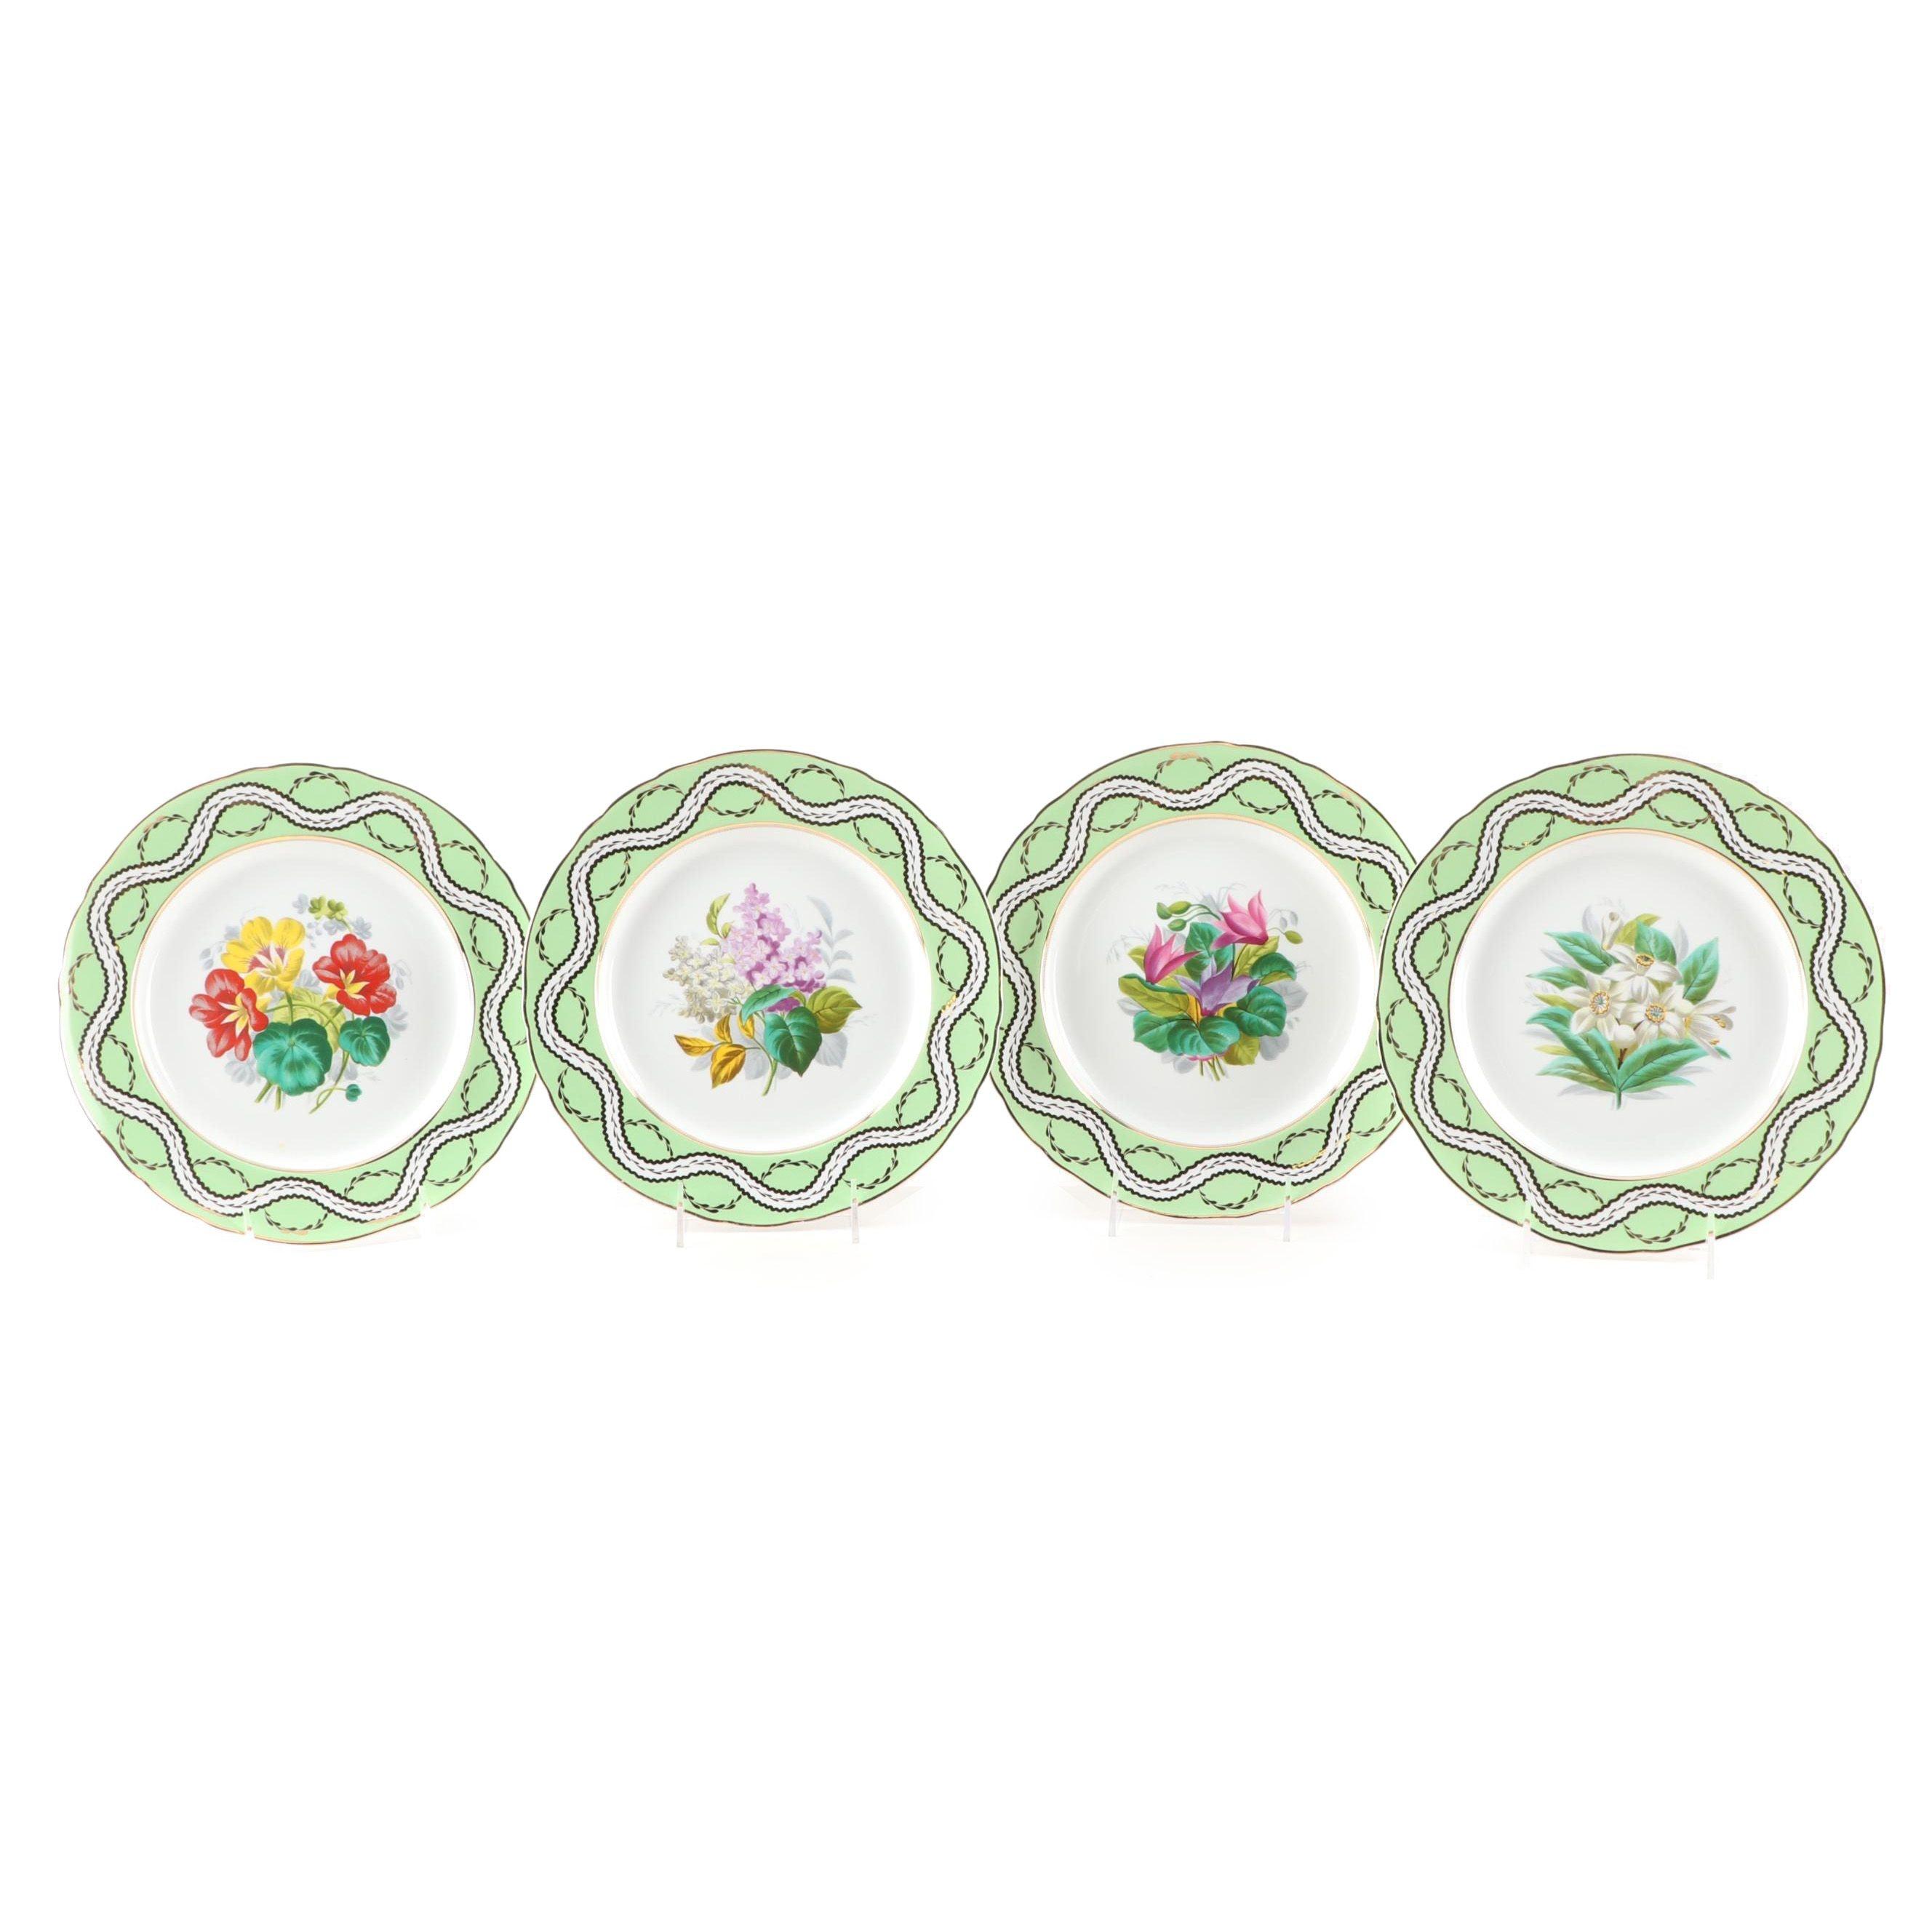 Botanical Porcelain Wall Plates